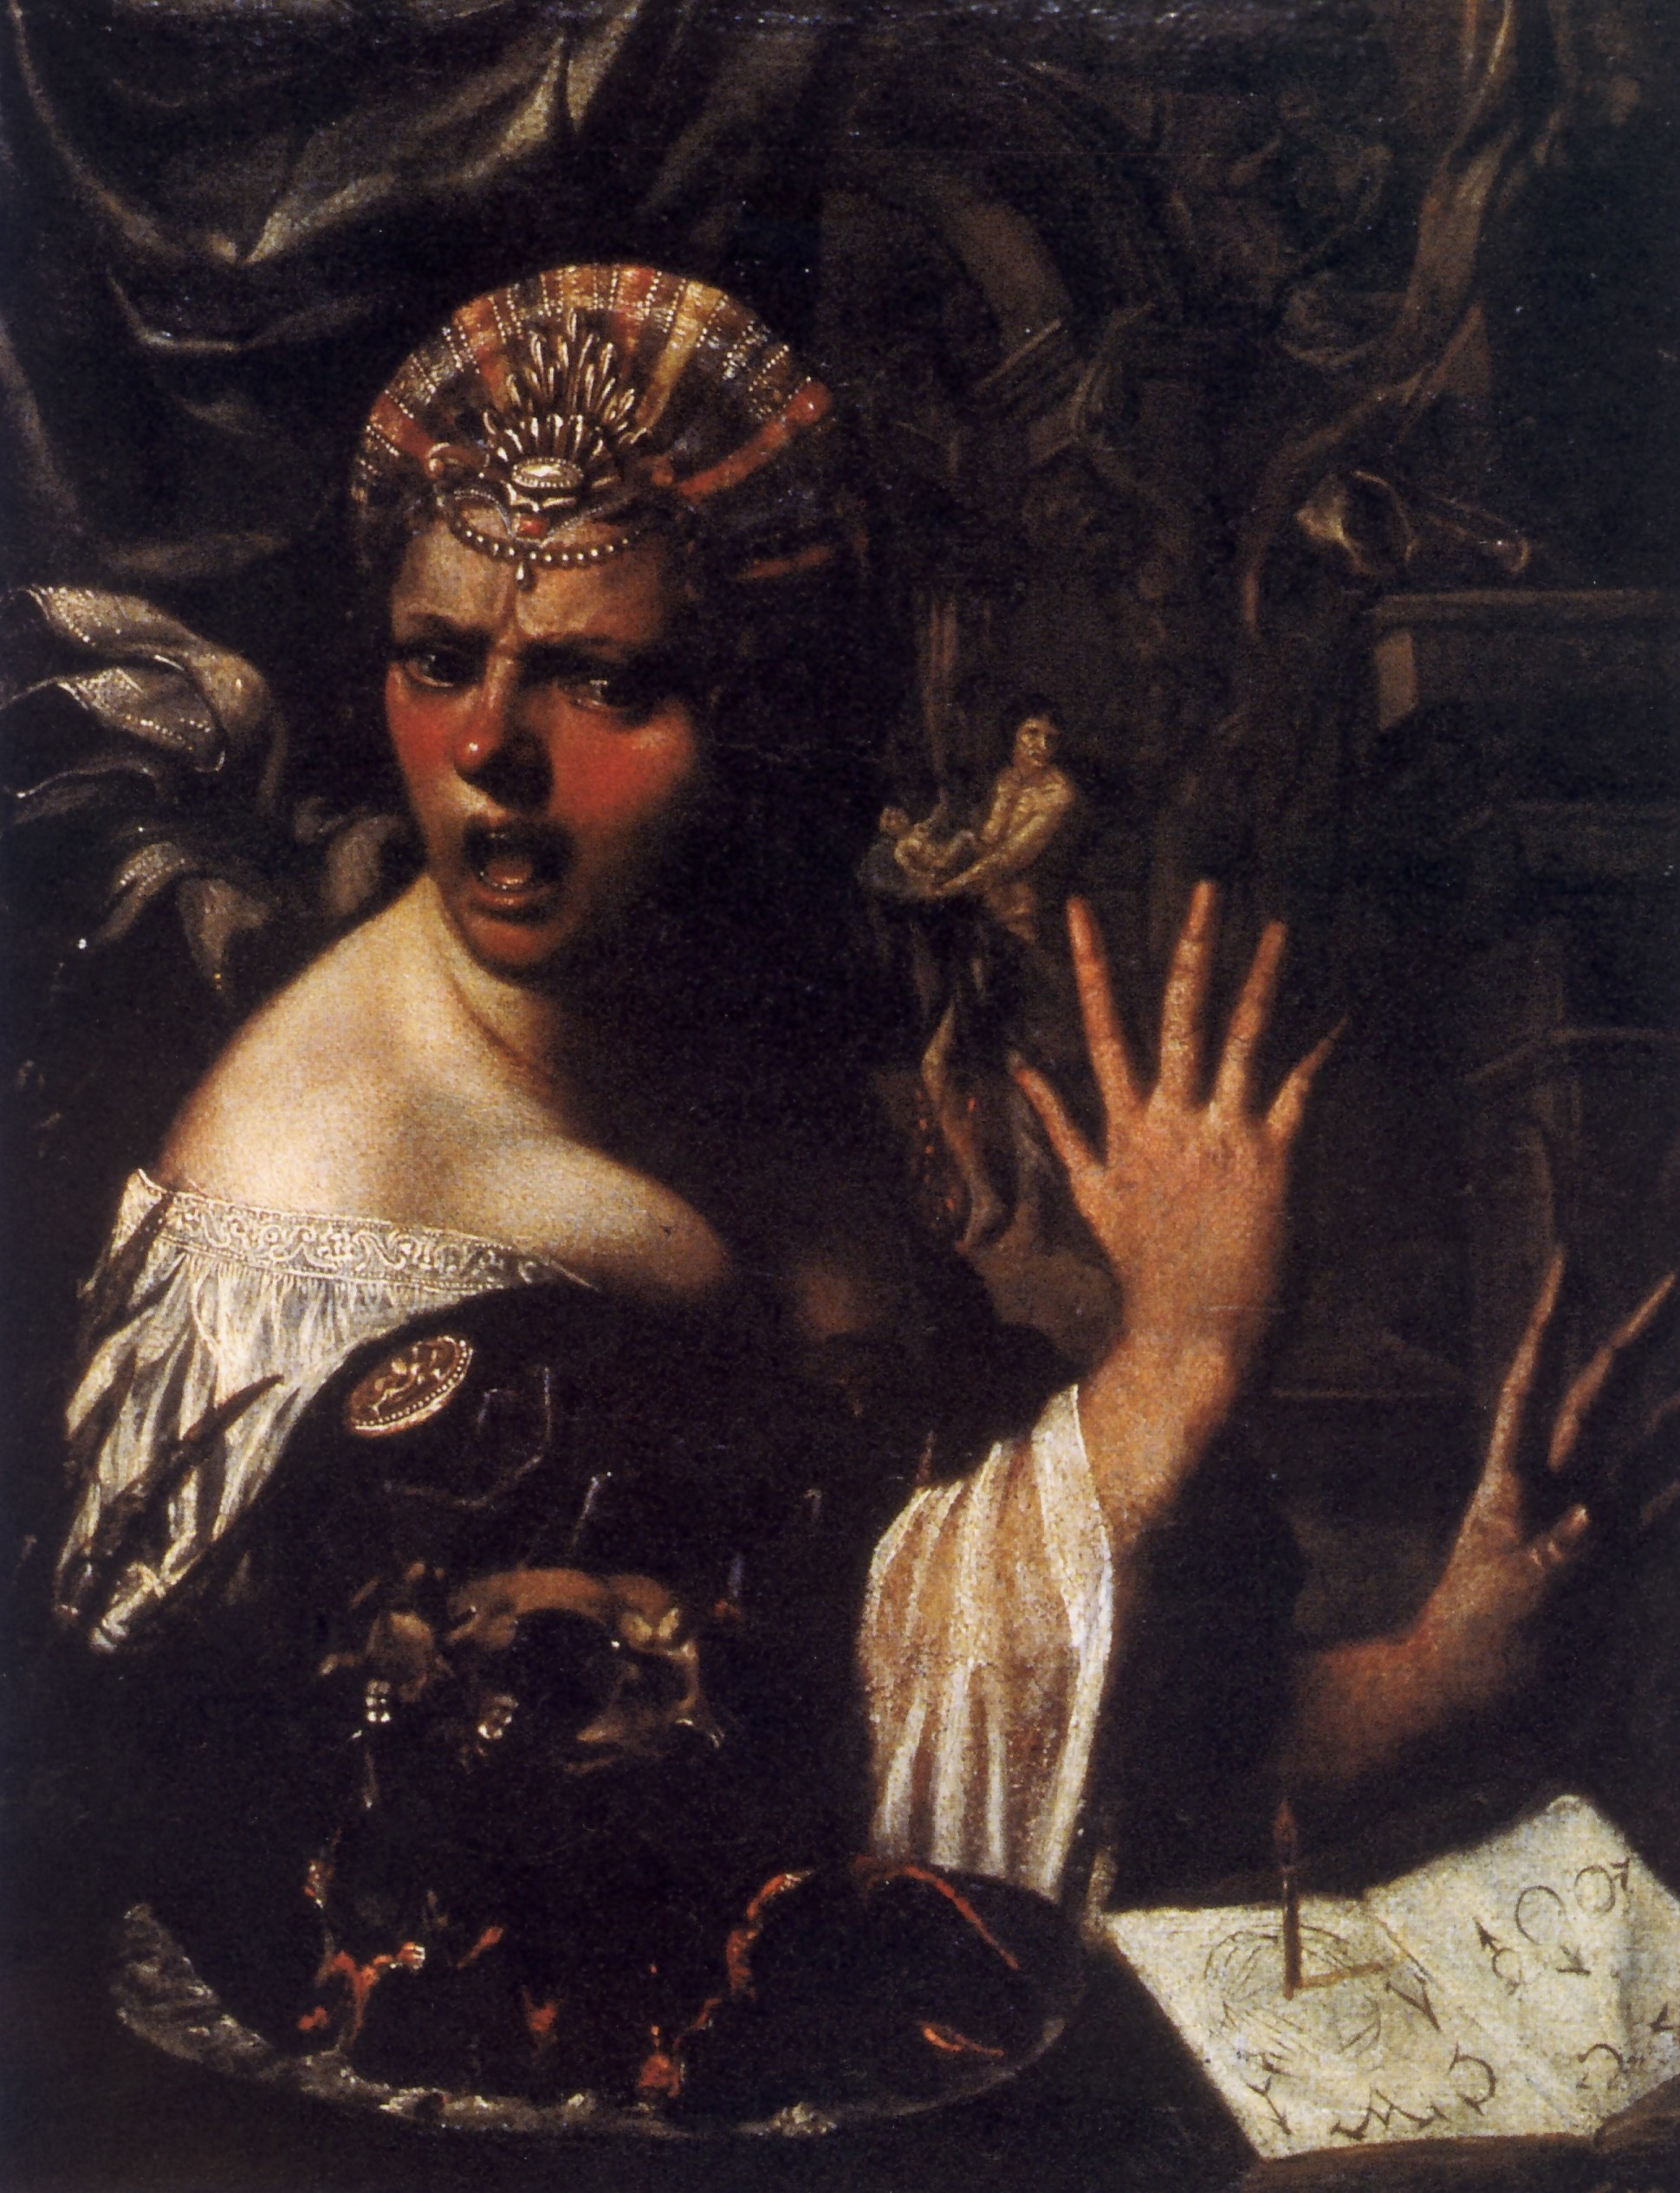 Angelo Caroselli, La negromante, XVII secolo - Ancona, Pinacoteca Civica